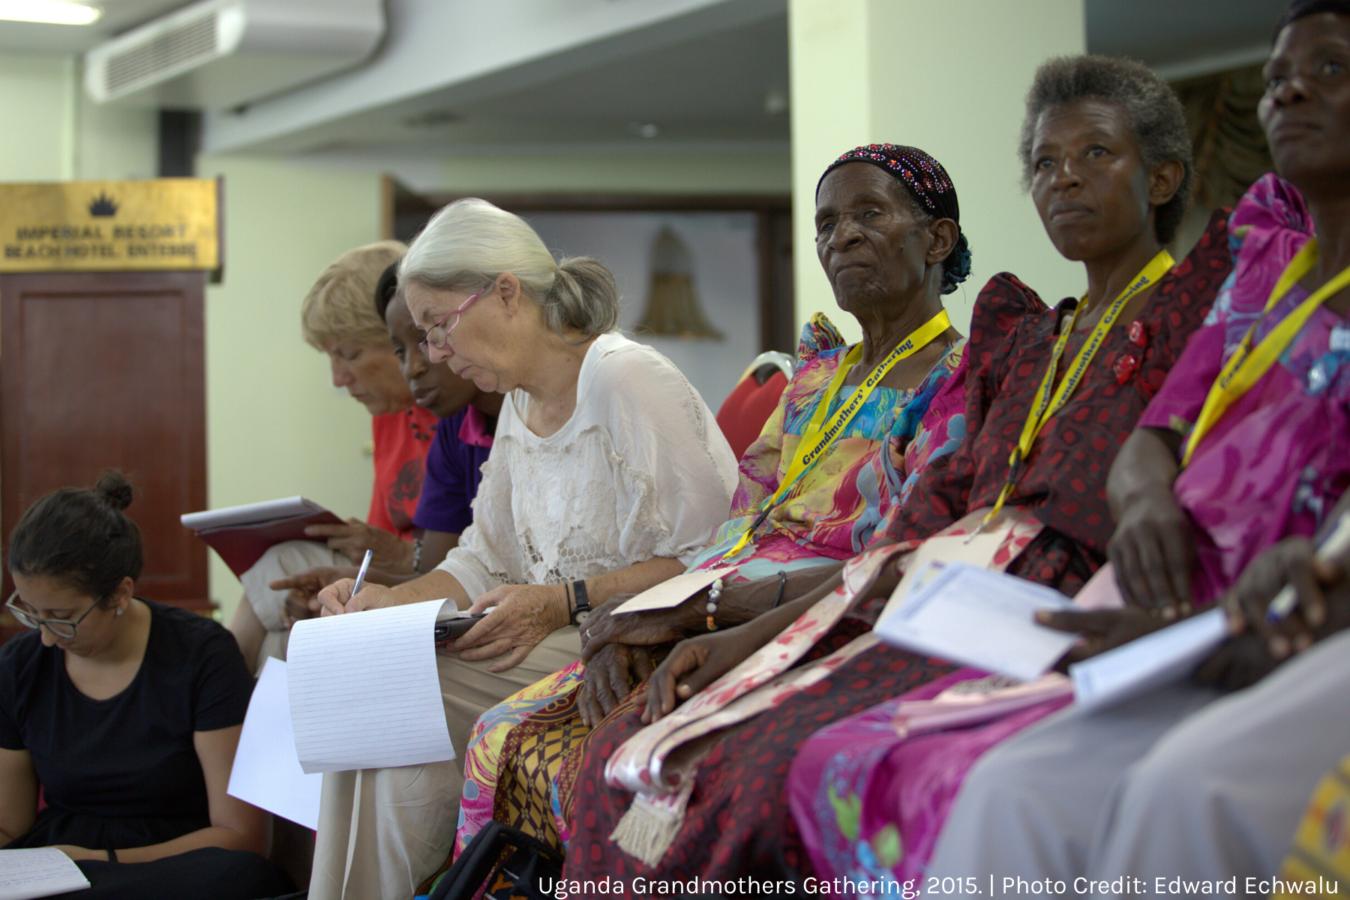 Uganda Grandmothers Gathering